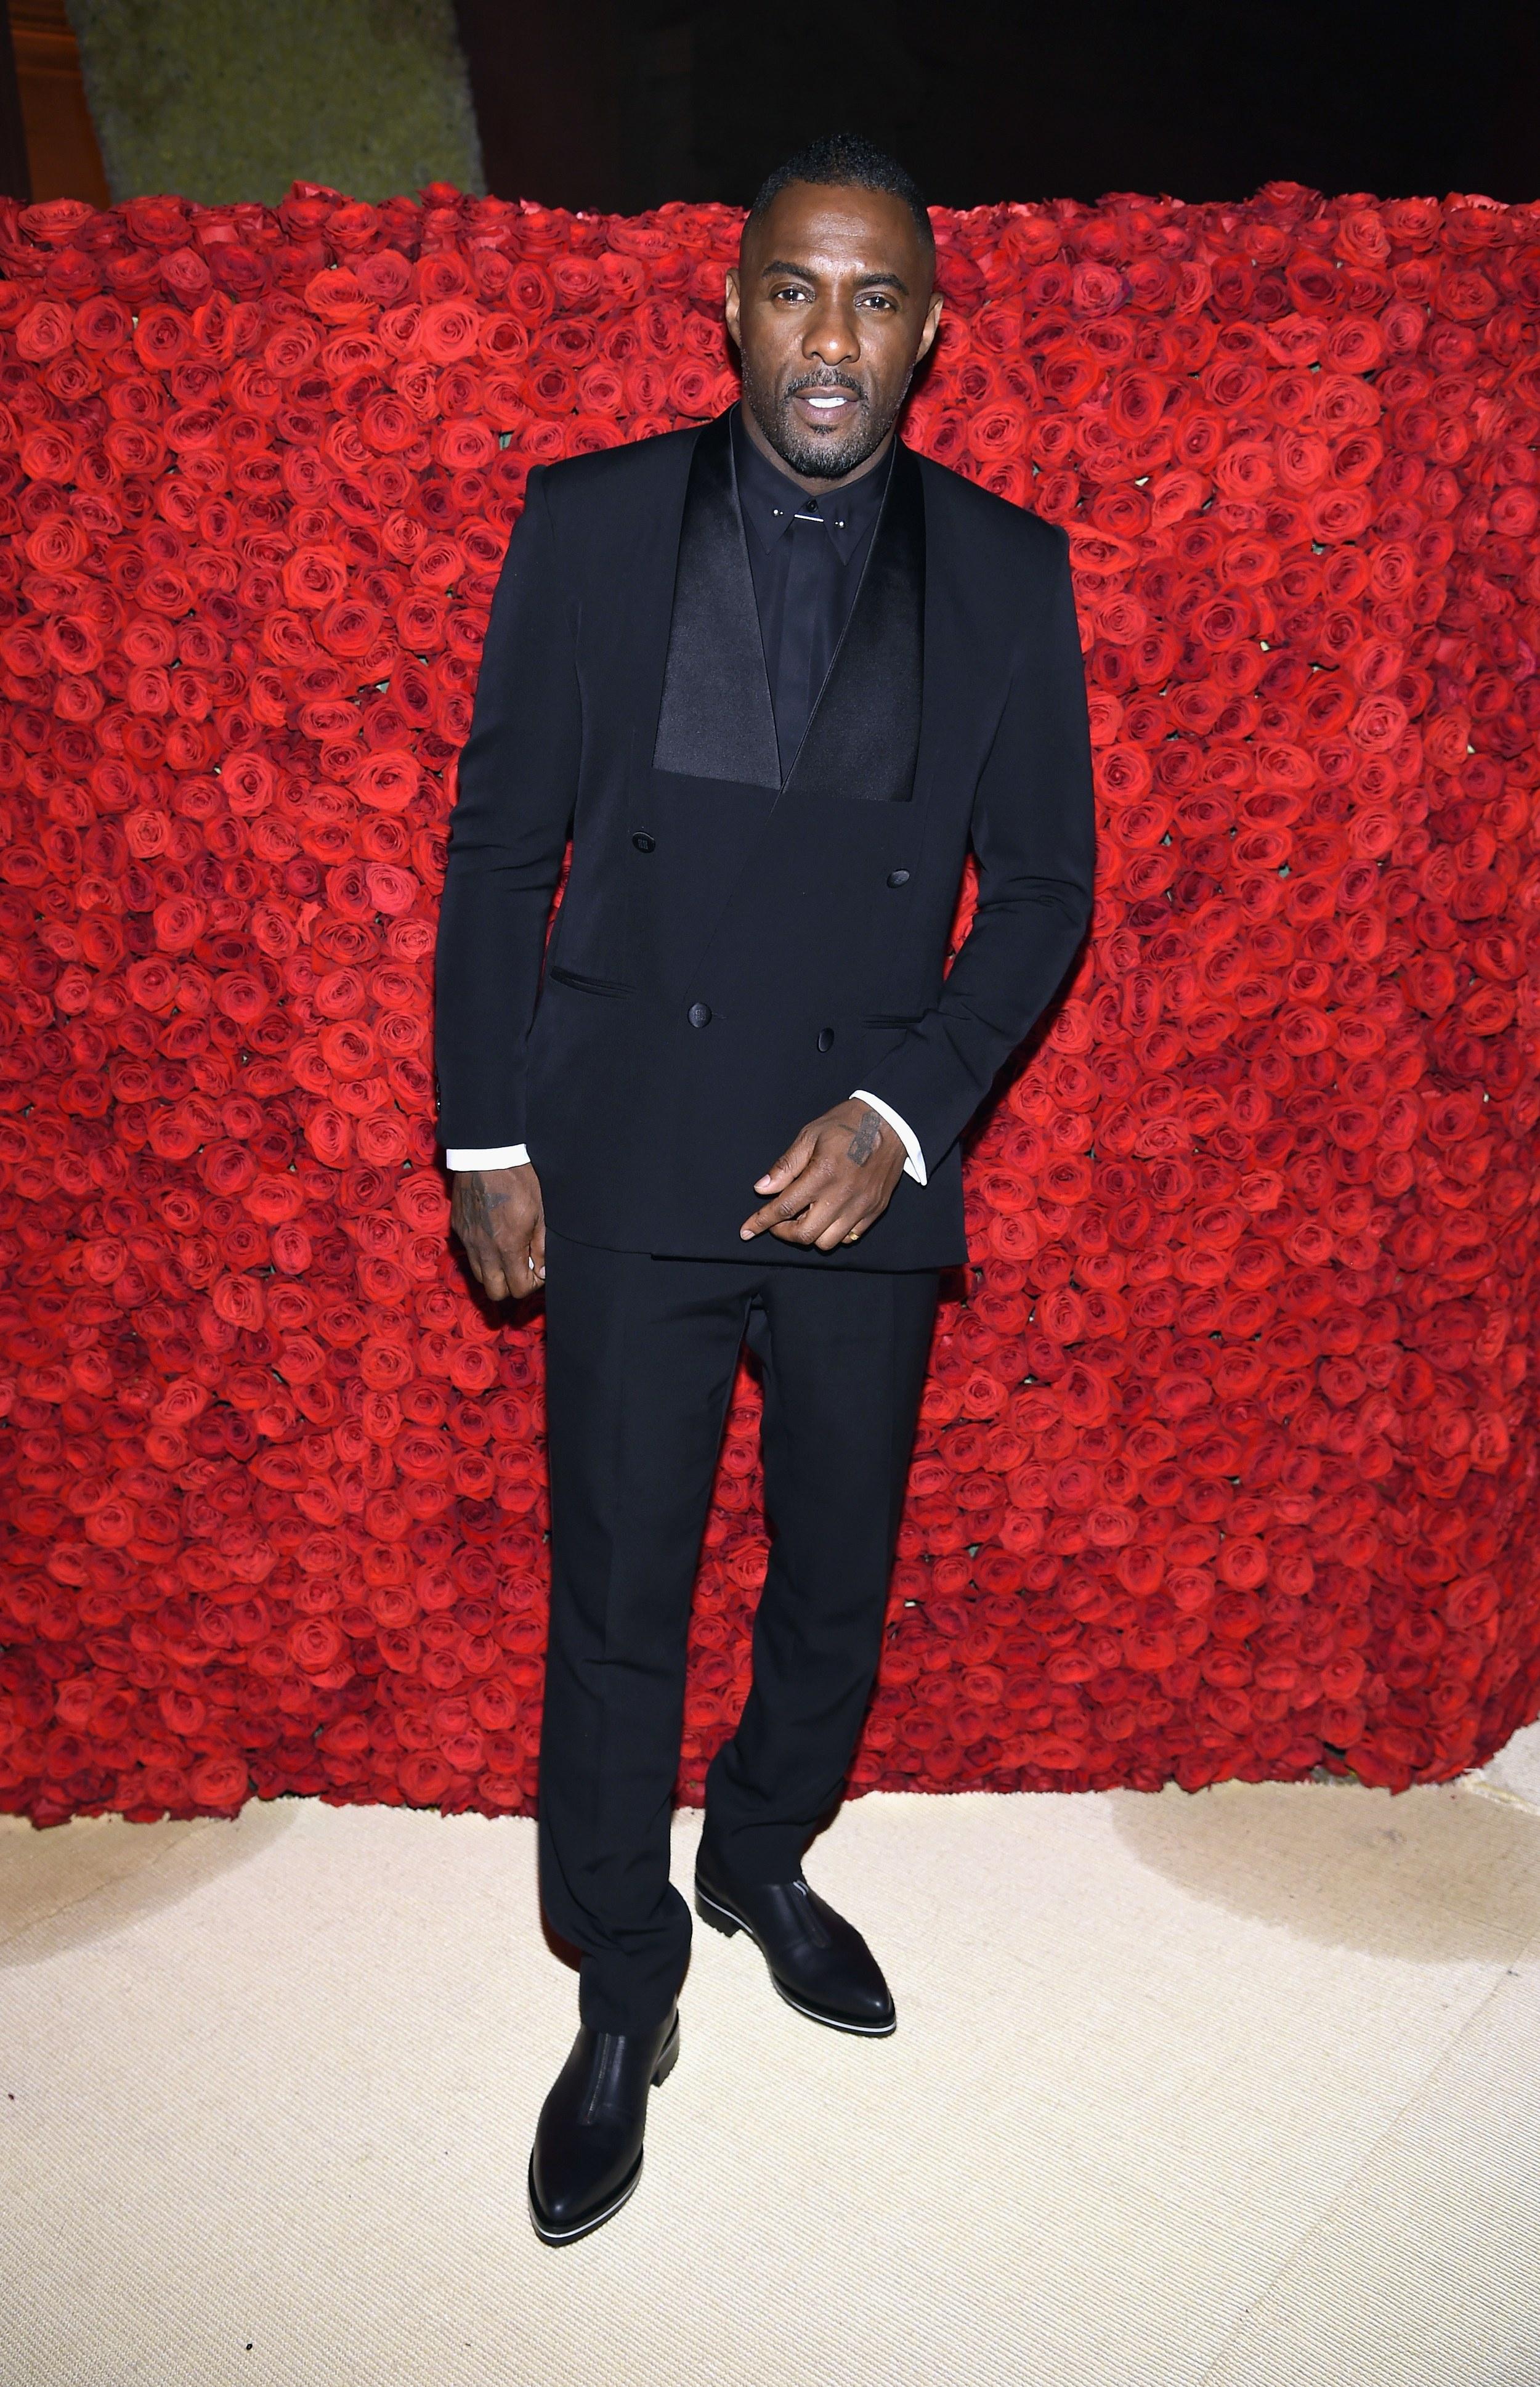 MG_Idris Elba GIvenchy Haute Couture.jpg